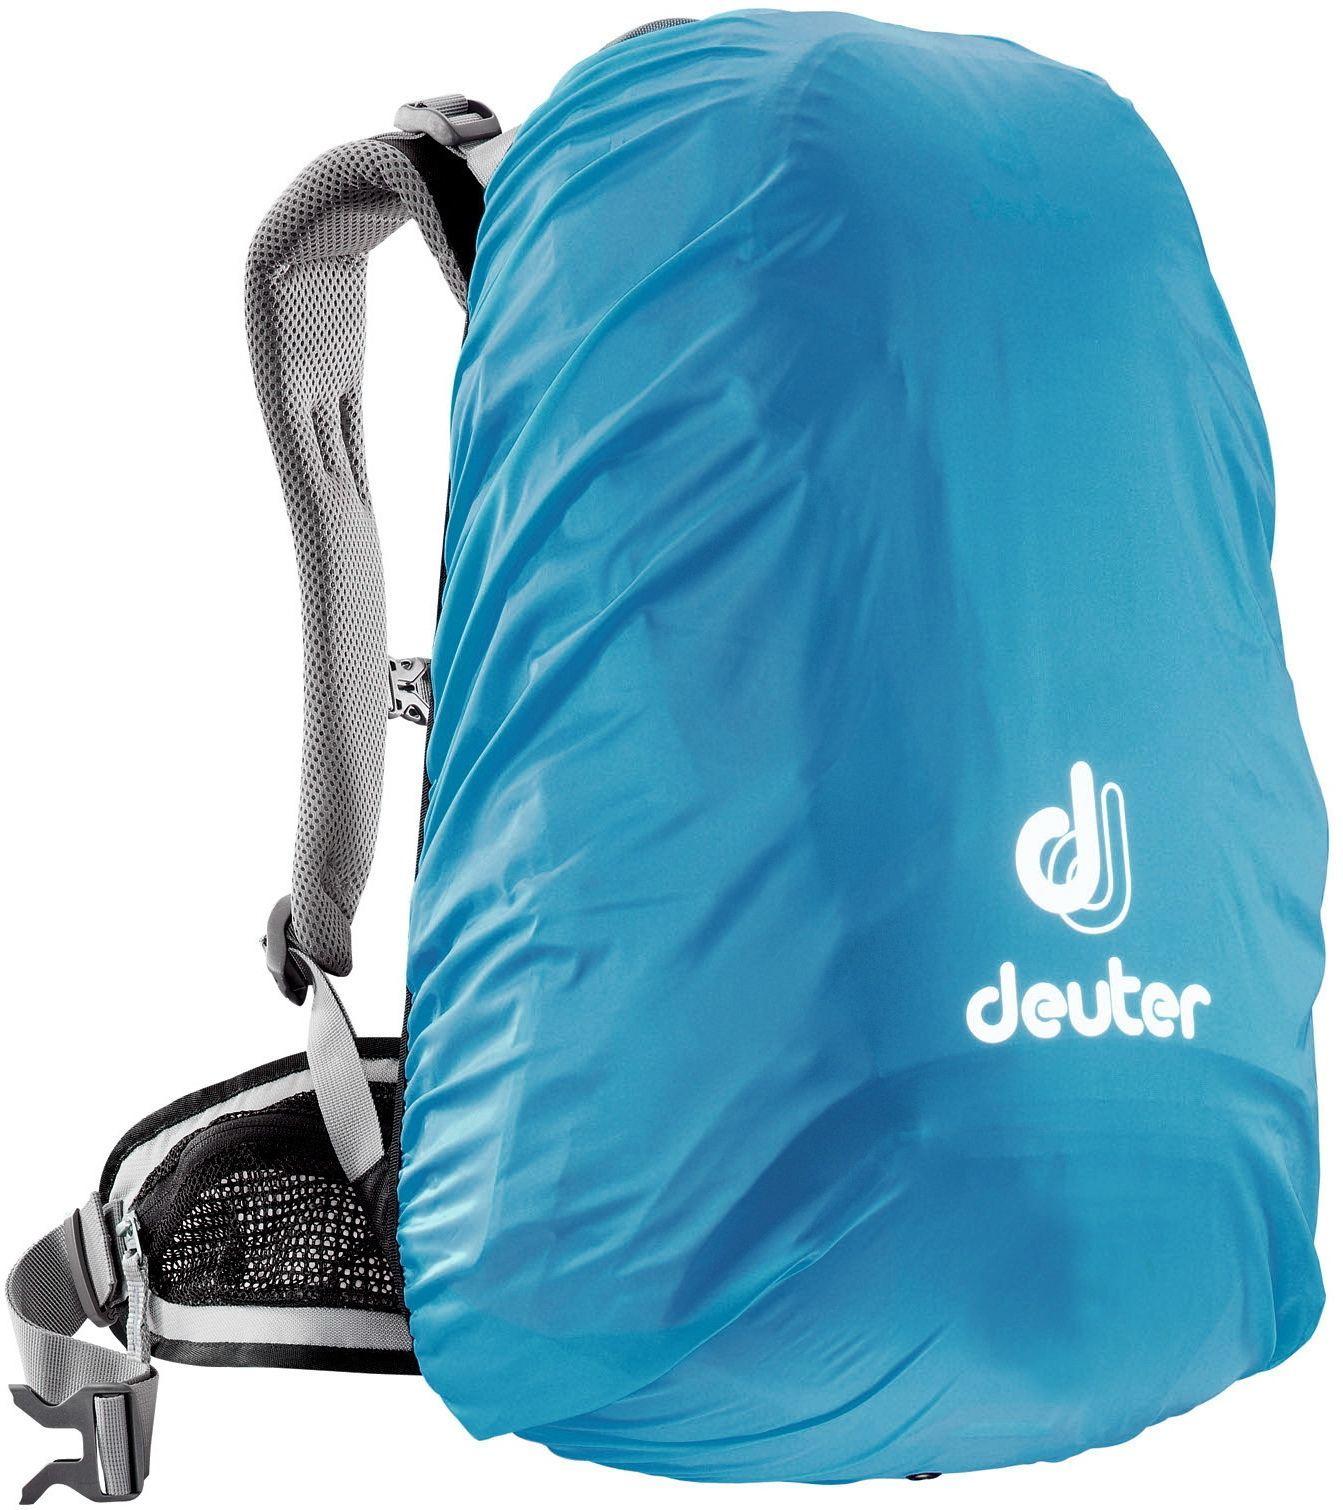 Чехол для рюкзака Deuter 2015 Raincover I coolblue, Велосипедные рюкзаки - арт. 607470281